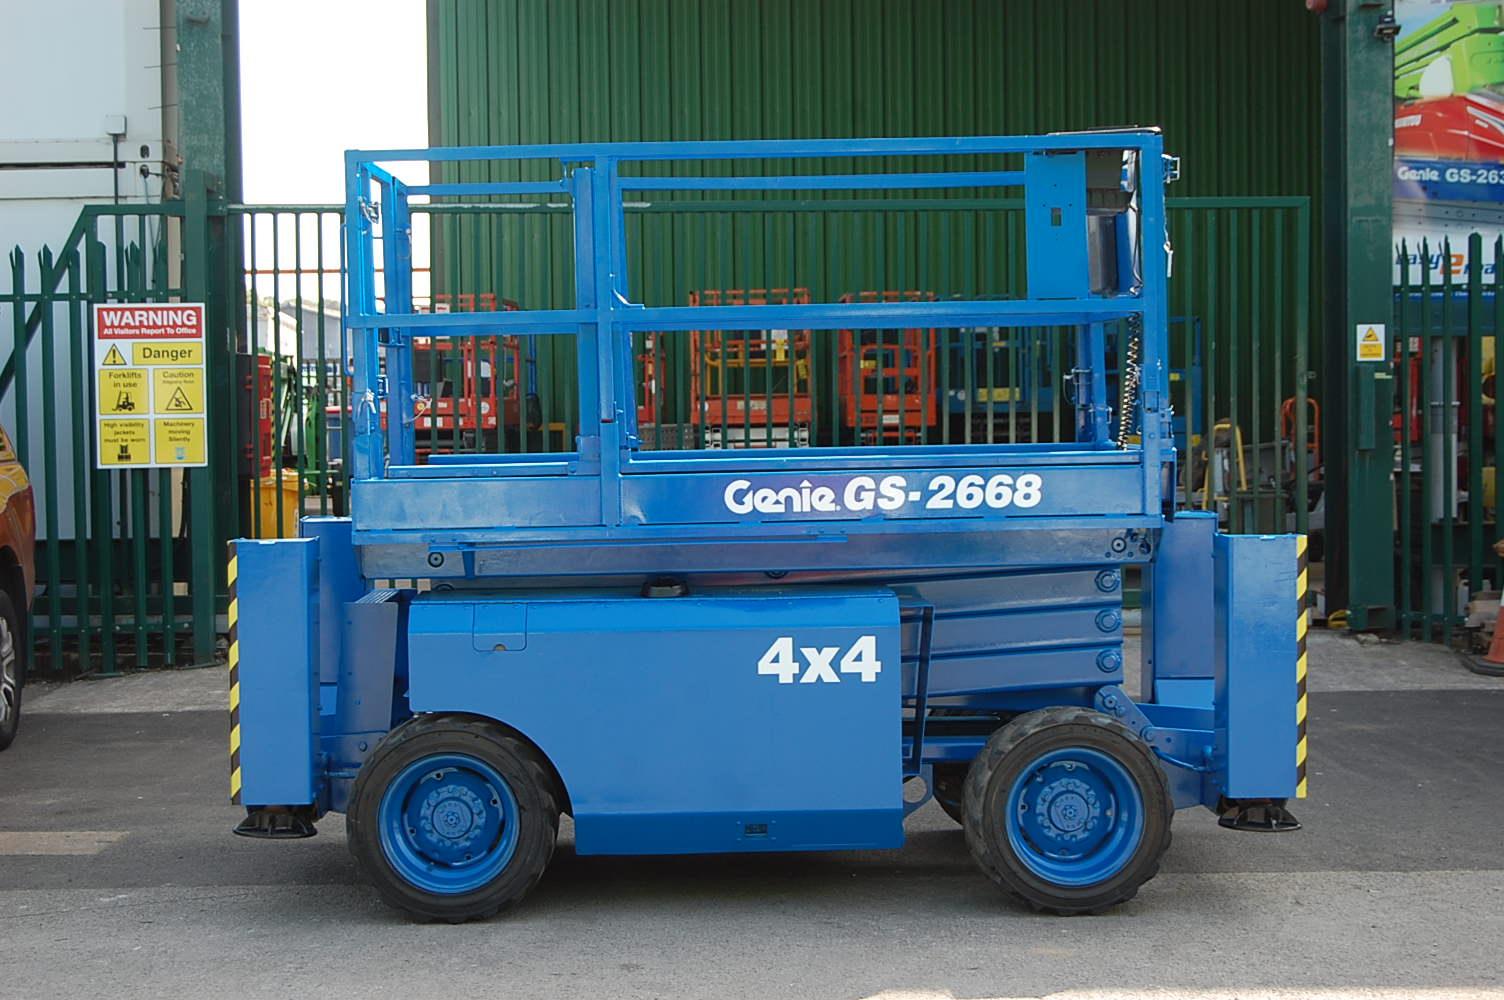 2007 Genie 2668 Rough Terrain Diesel Scissor Lift 10m